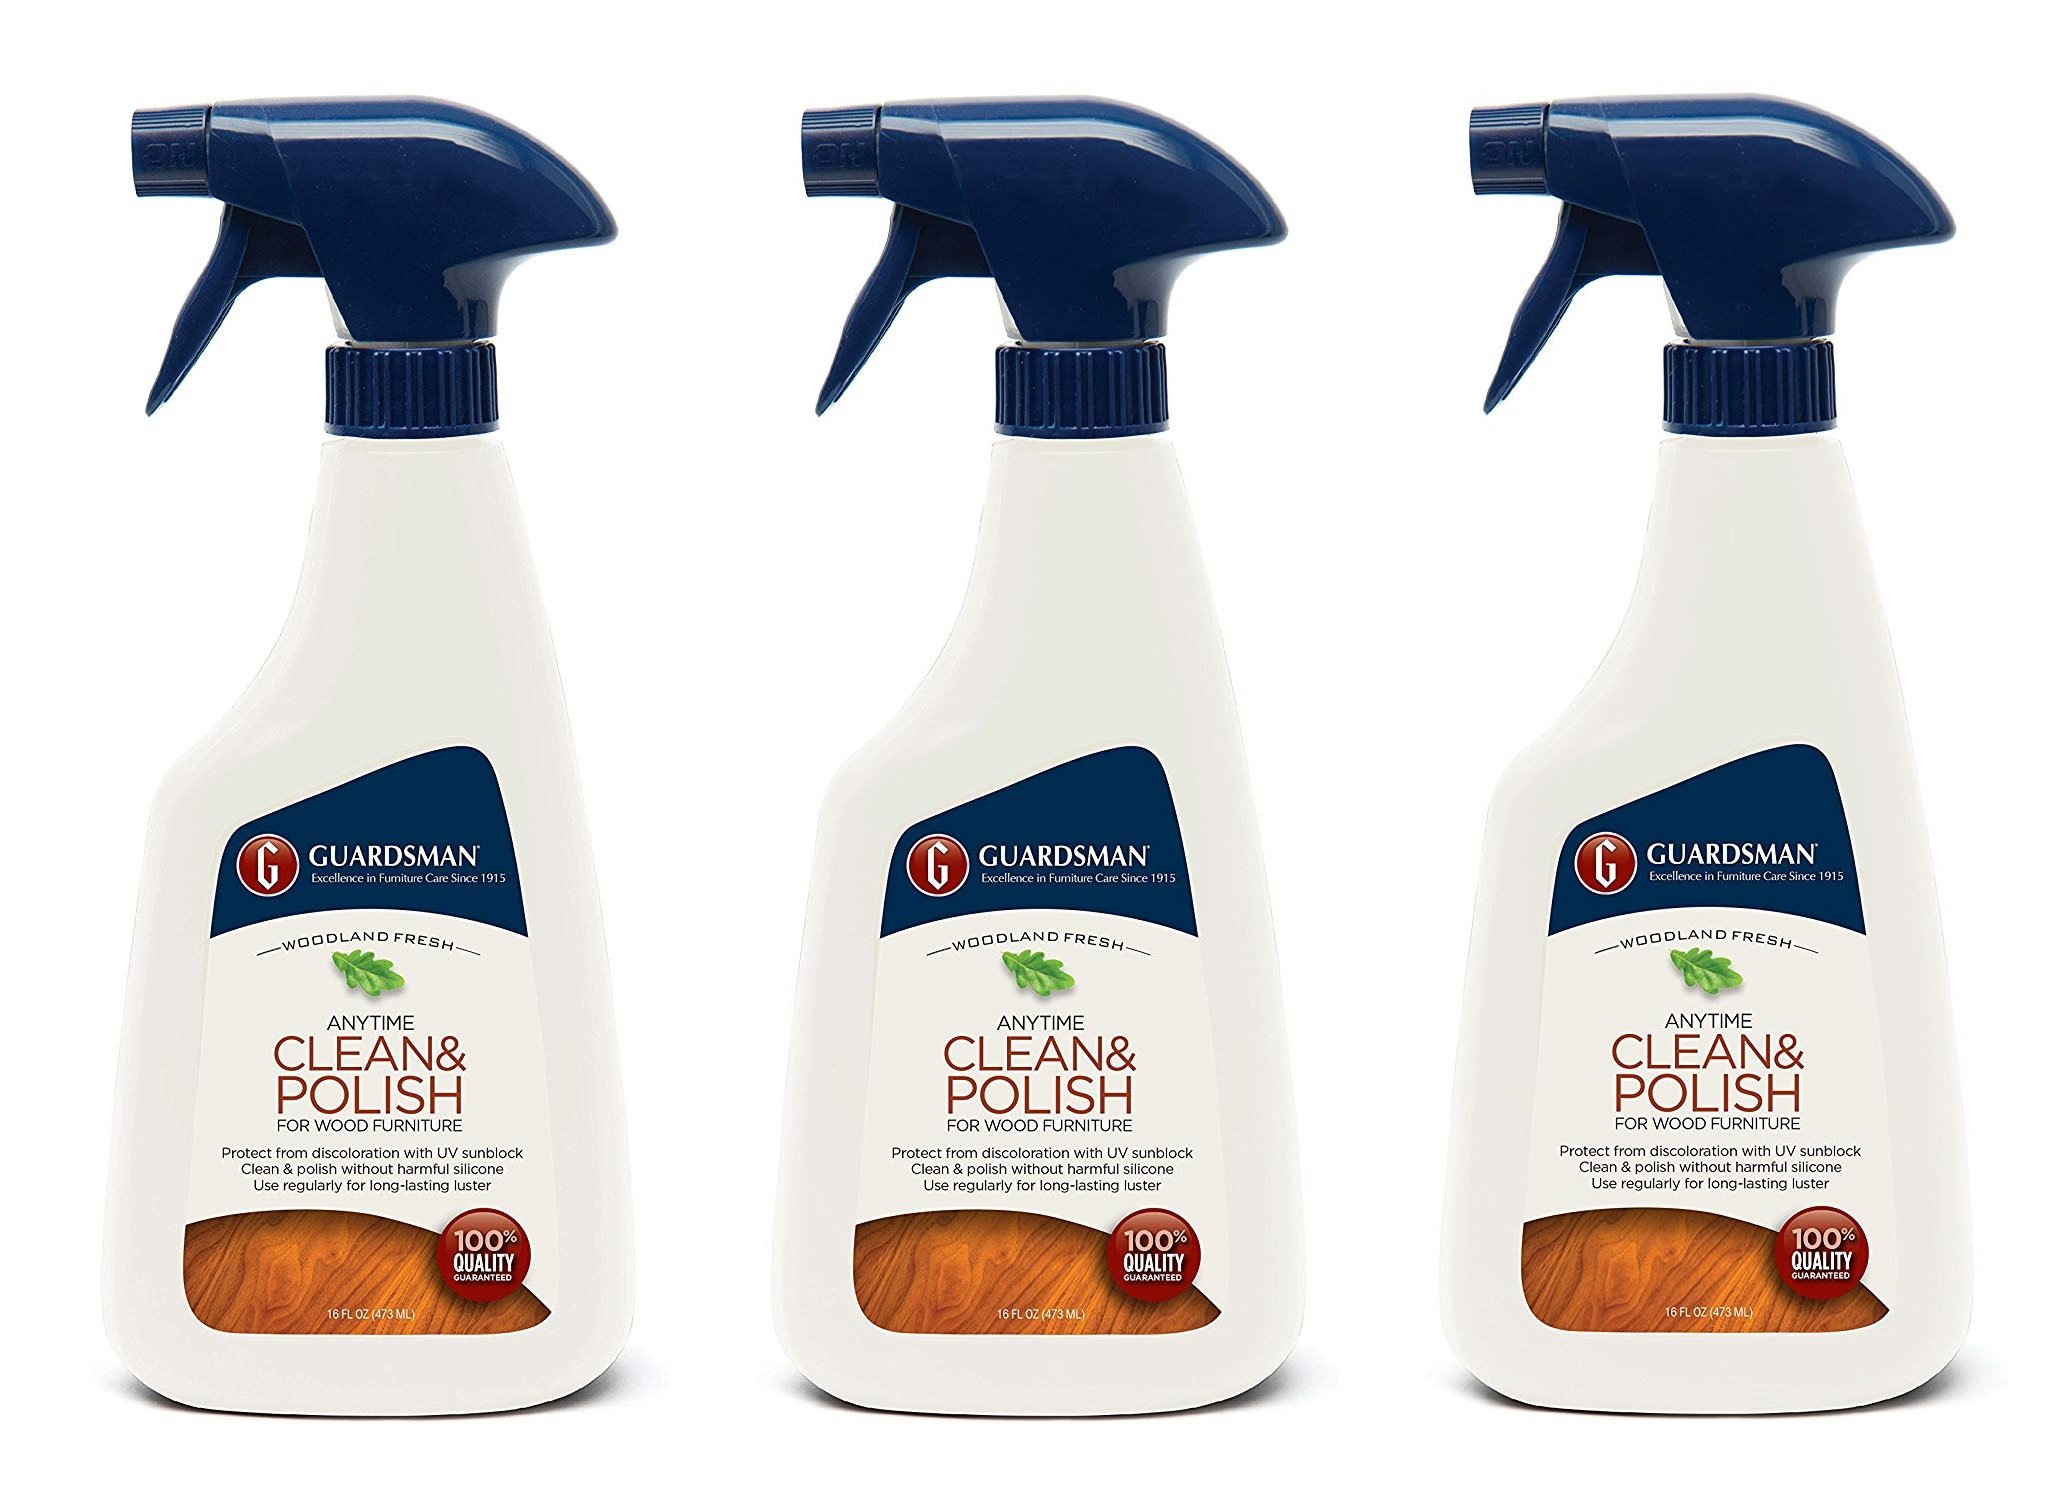 Guardsman Clean & Polish For Wood Furniture - Woodland Fresh - 16 oz Spray - Silicone Free, UV Protection - 461100 (3-(Pack))